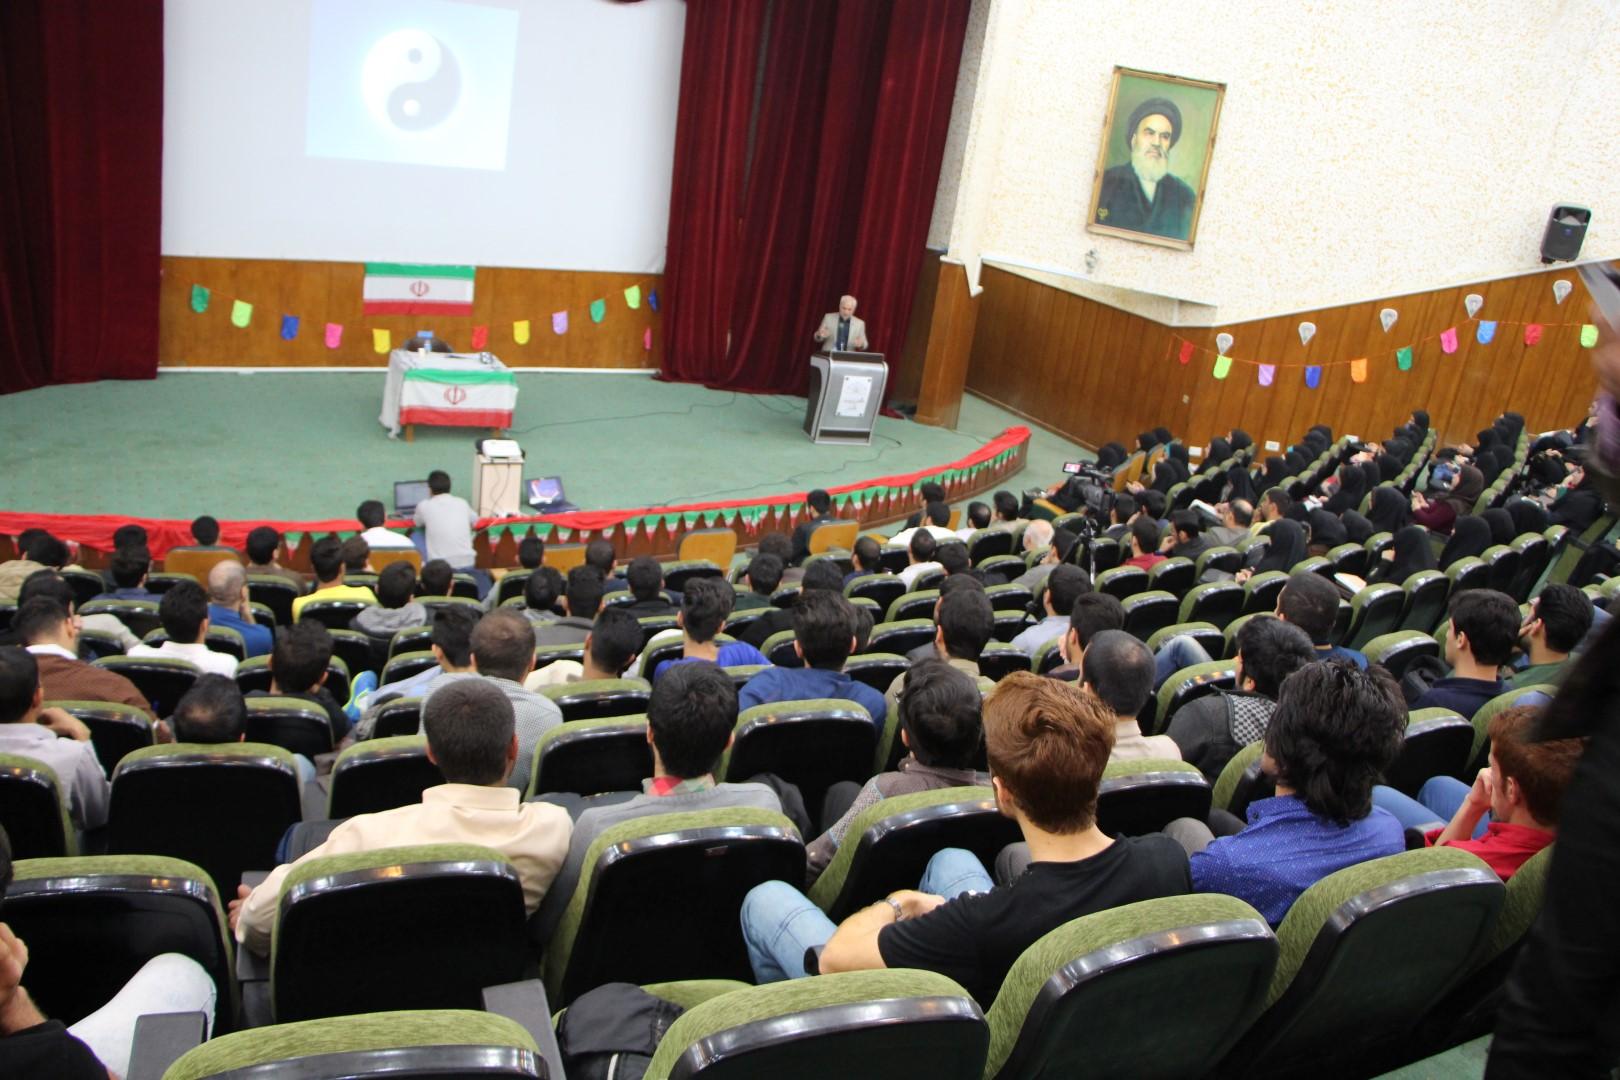 IMG 5201 گزارش تصویری؛ سخنرانی استاد حسن عباسی با موضوع از چوئن لای تا سیاست درهای باز